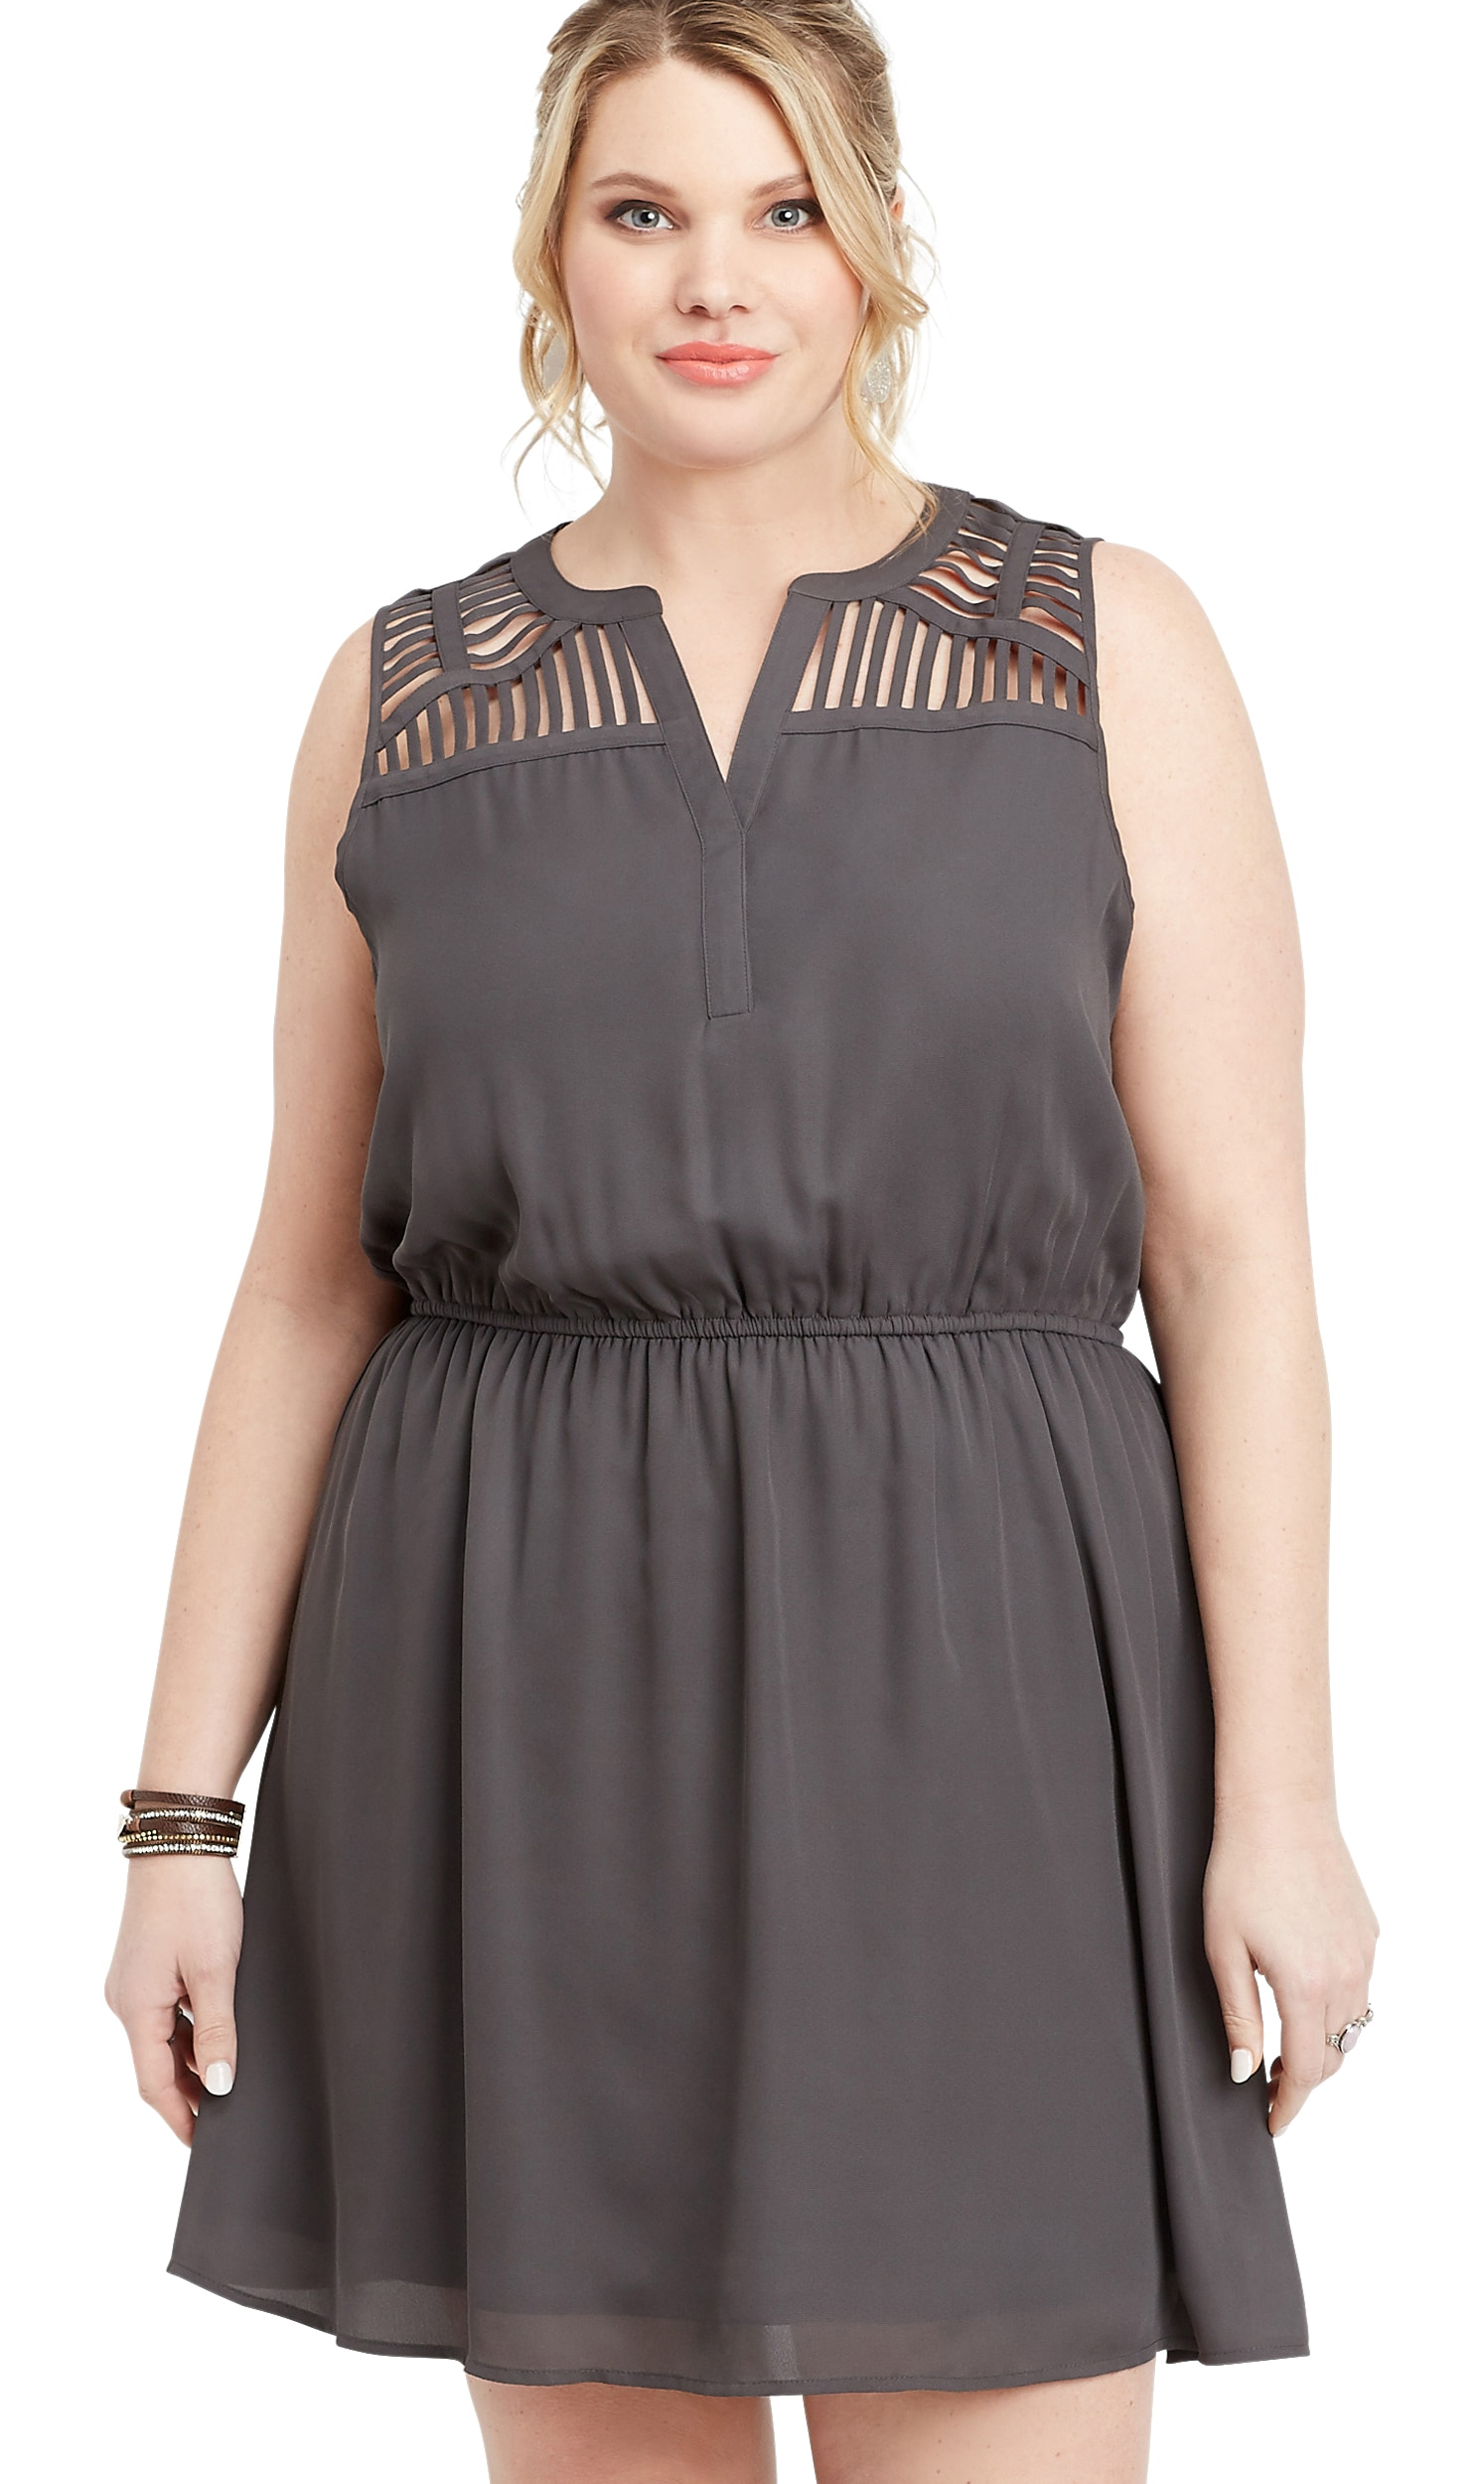 maurices - Plus Size Lattice Shoulder V-Neck Dress - Walmart.com